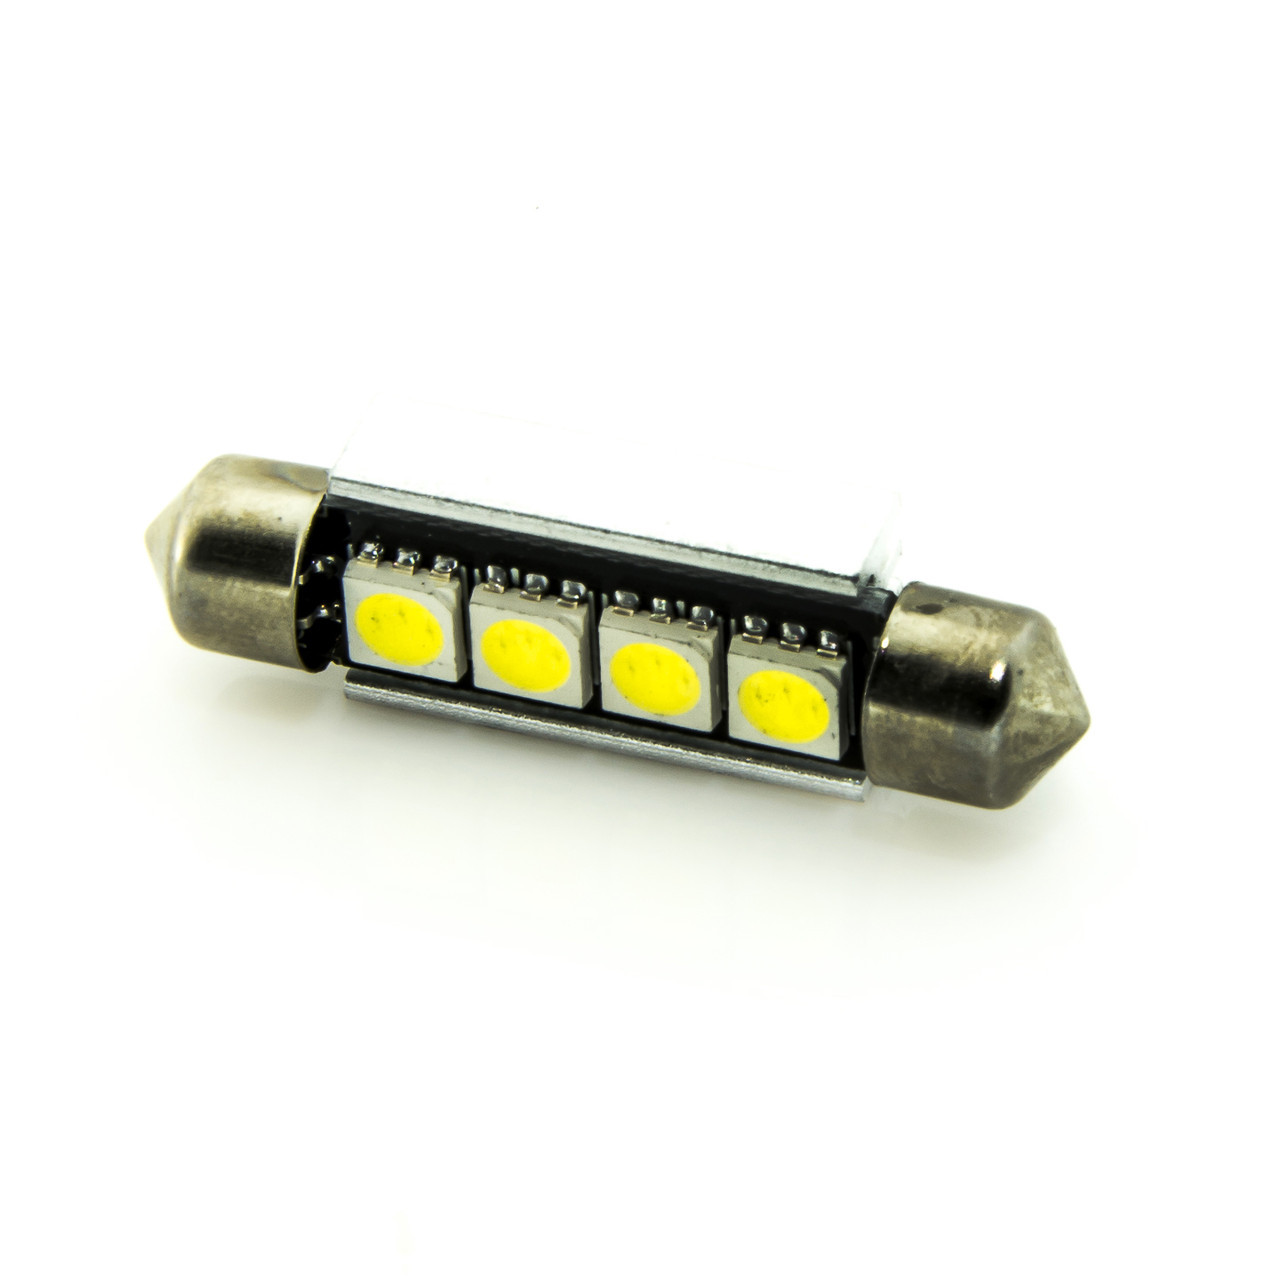 Лампа LED 12V AC (C5W) 4SMD 5050 42мм обманка 56Lm БЕЛЫЙ